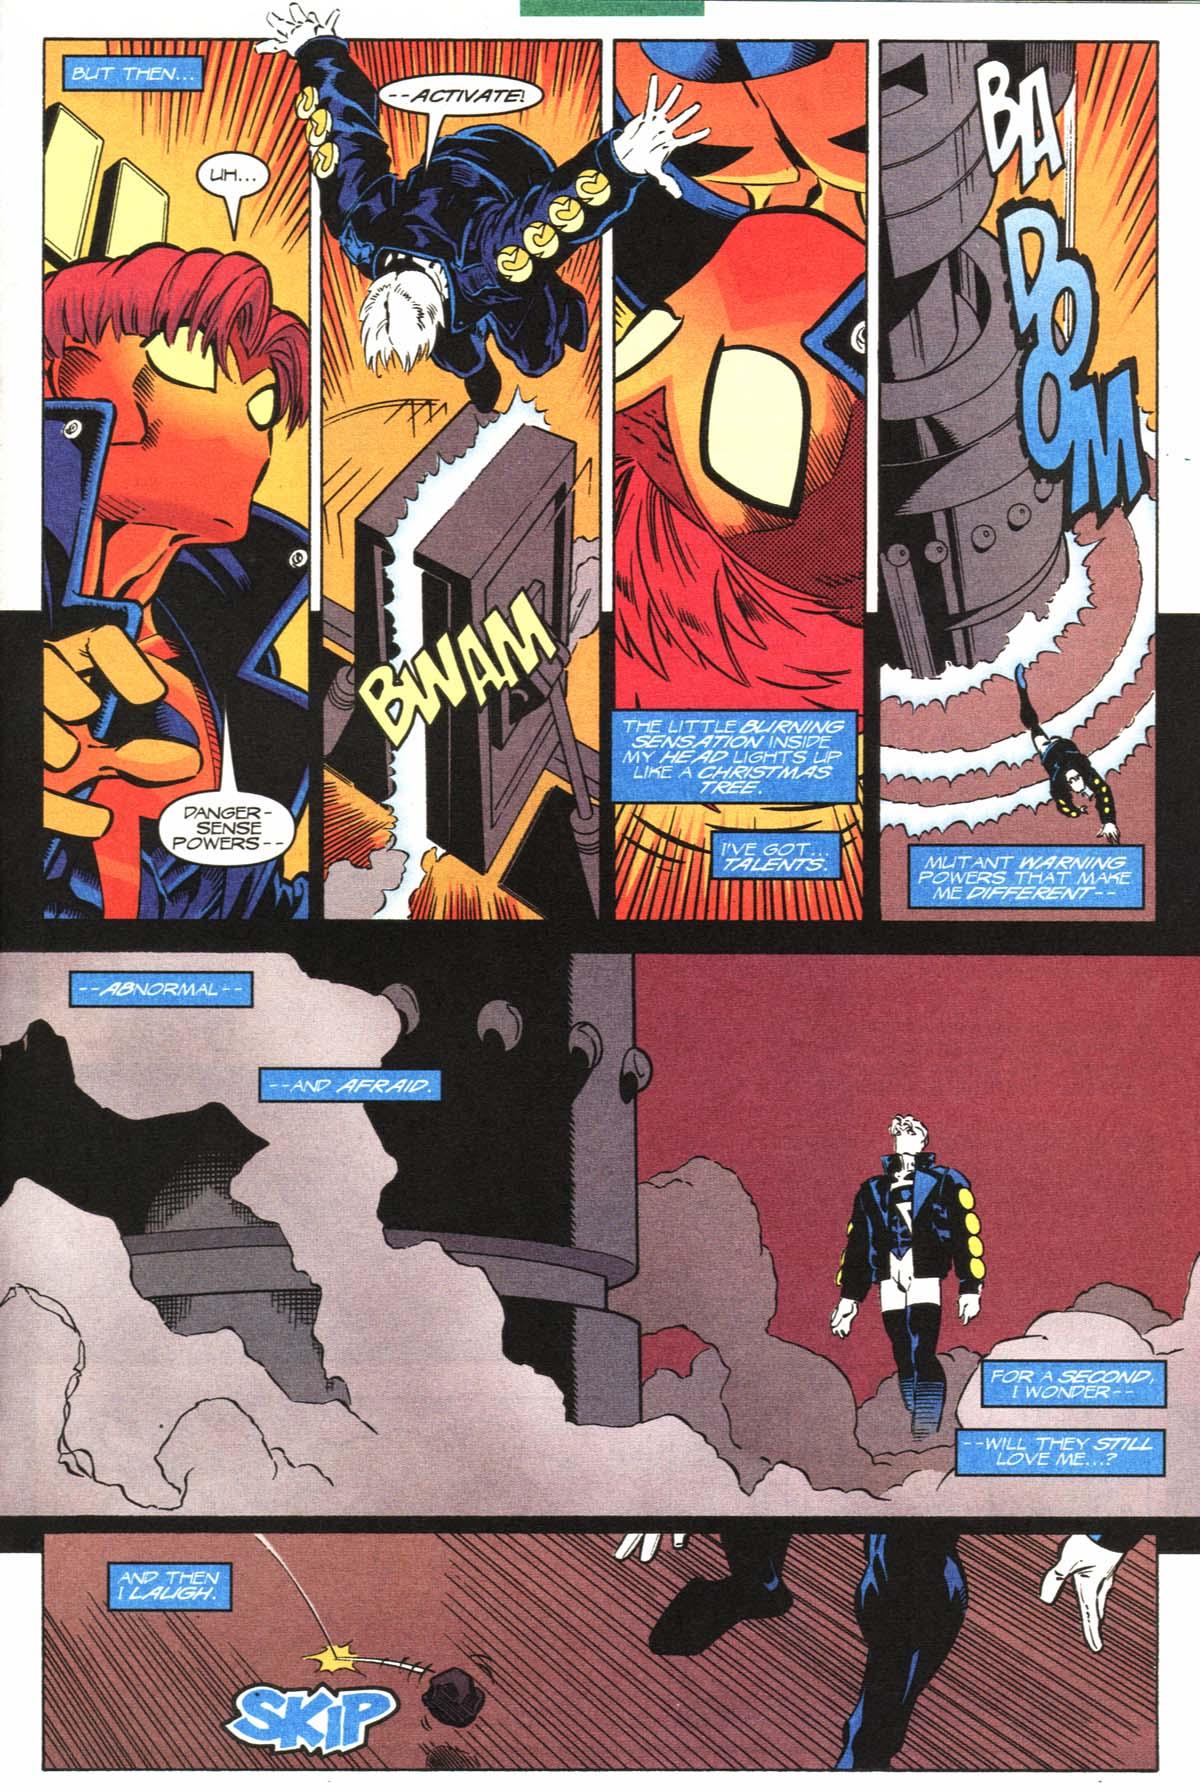 Read online Slingers comic -  Issue #11 - 17